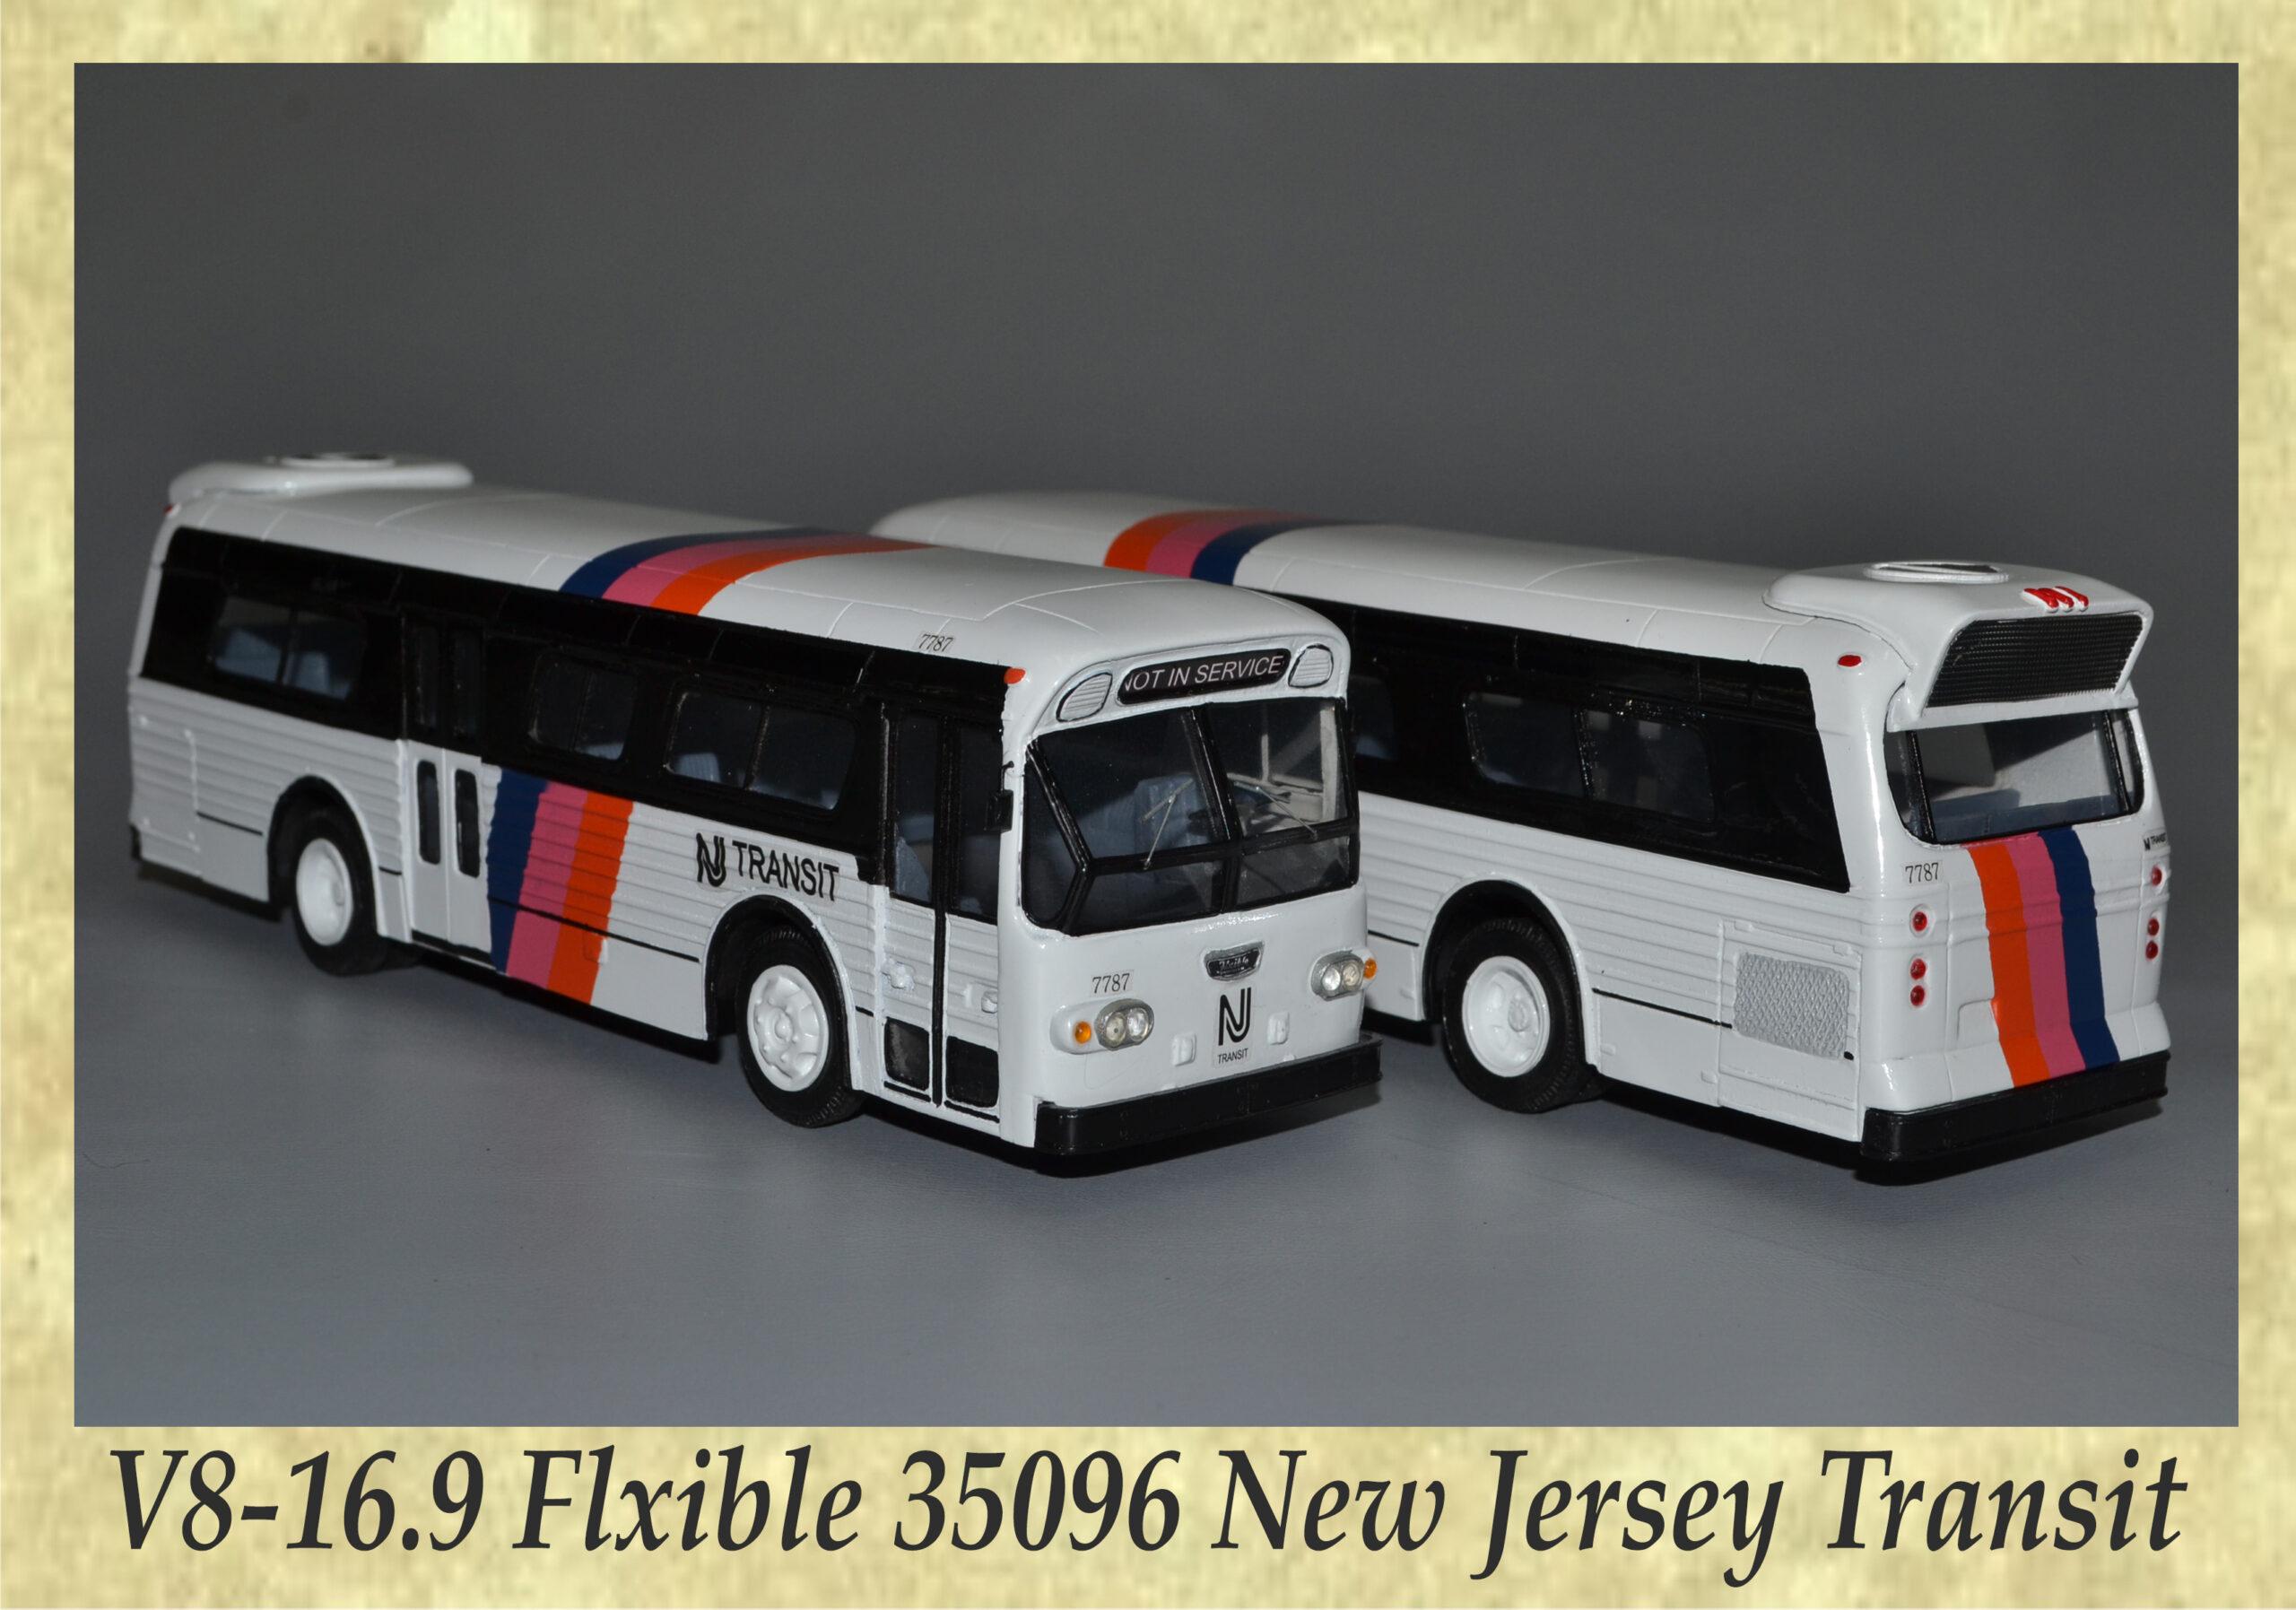 V8-16.9 Flxible 35096 New Jersey Transit